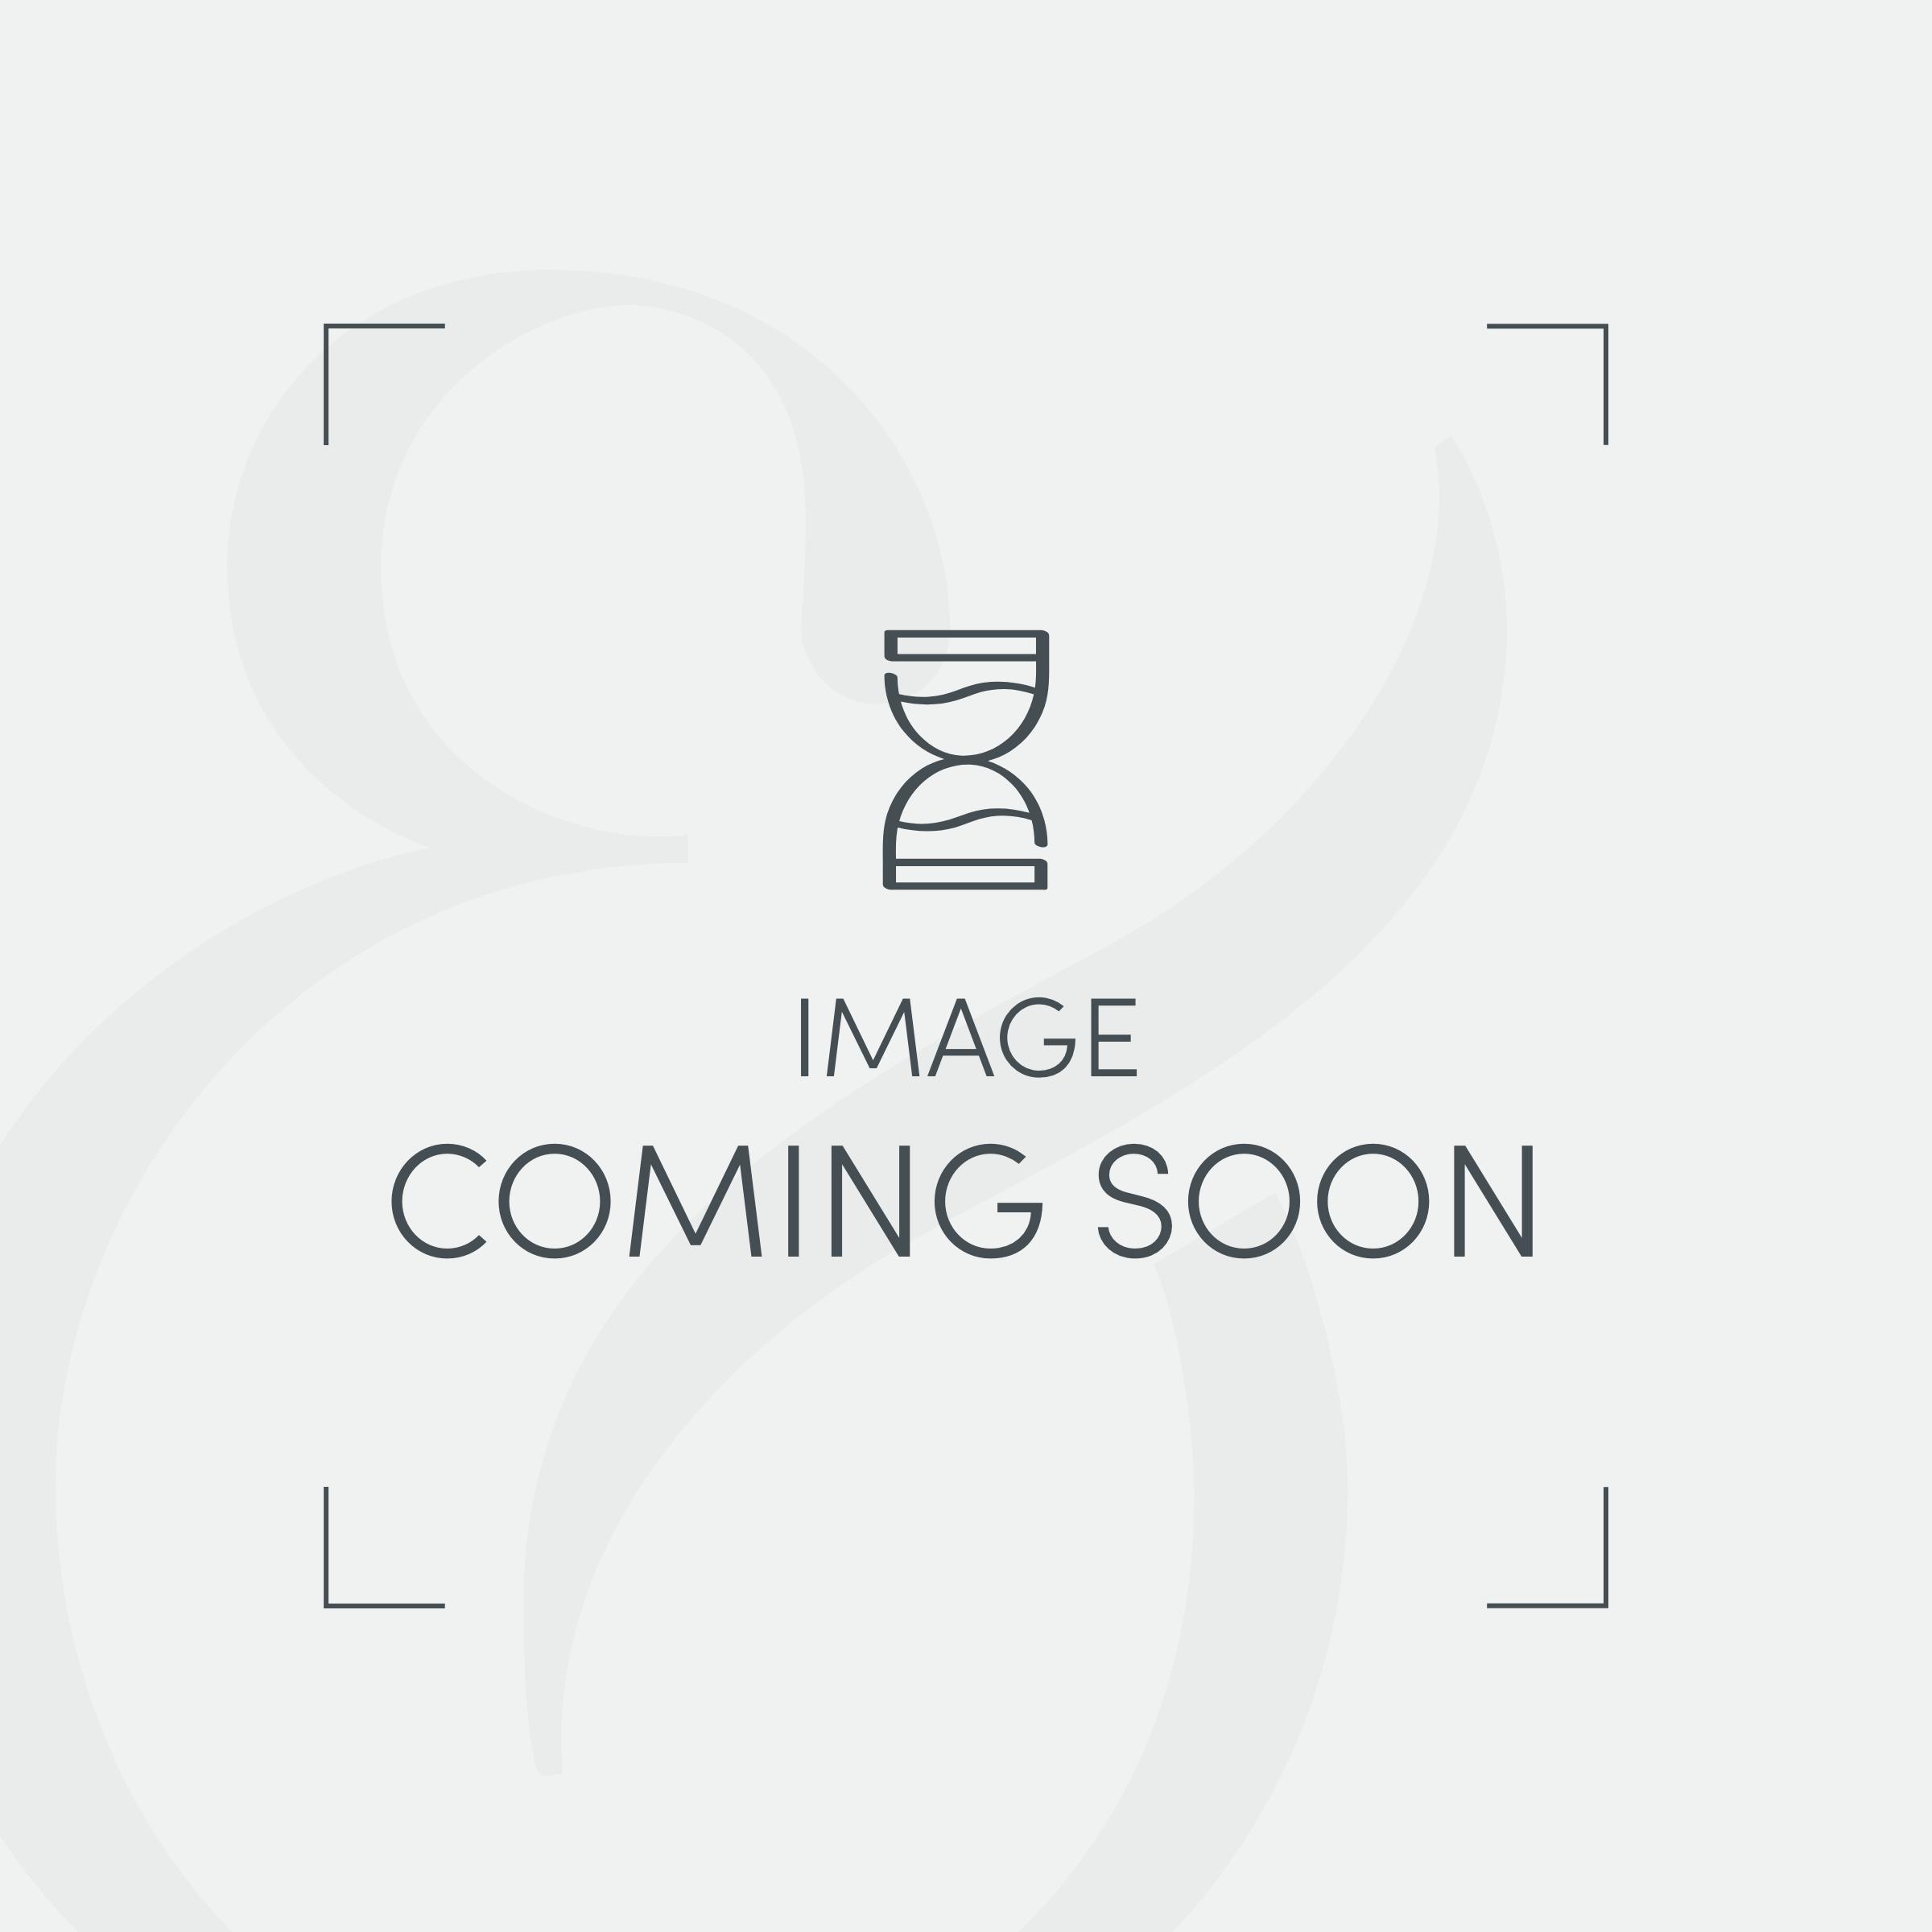 Supersoft Cotton-Cashmere Blend - King Duvet Cover - Grey